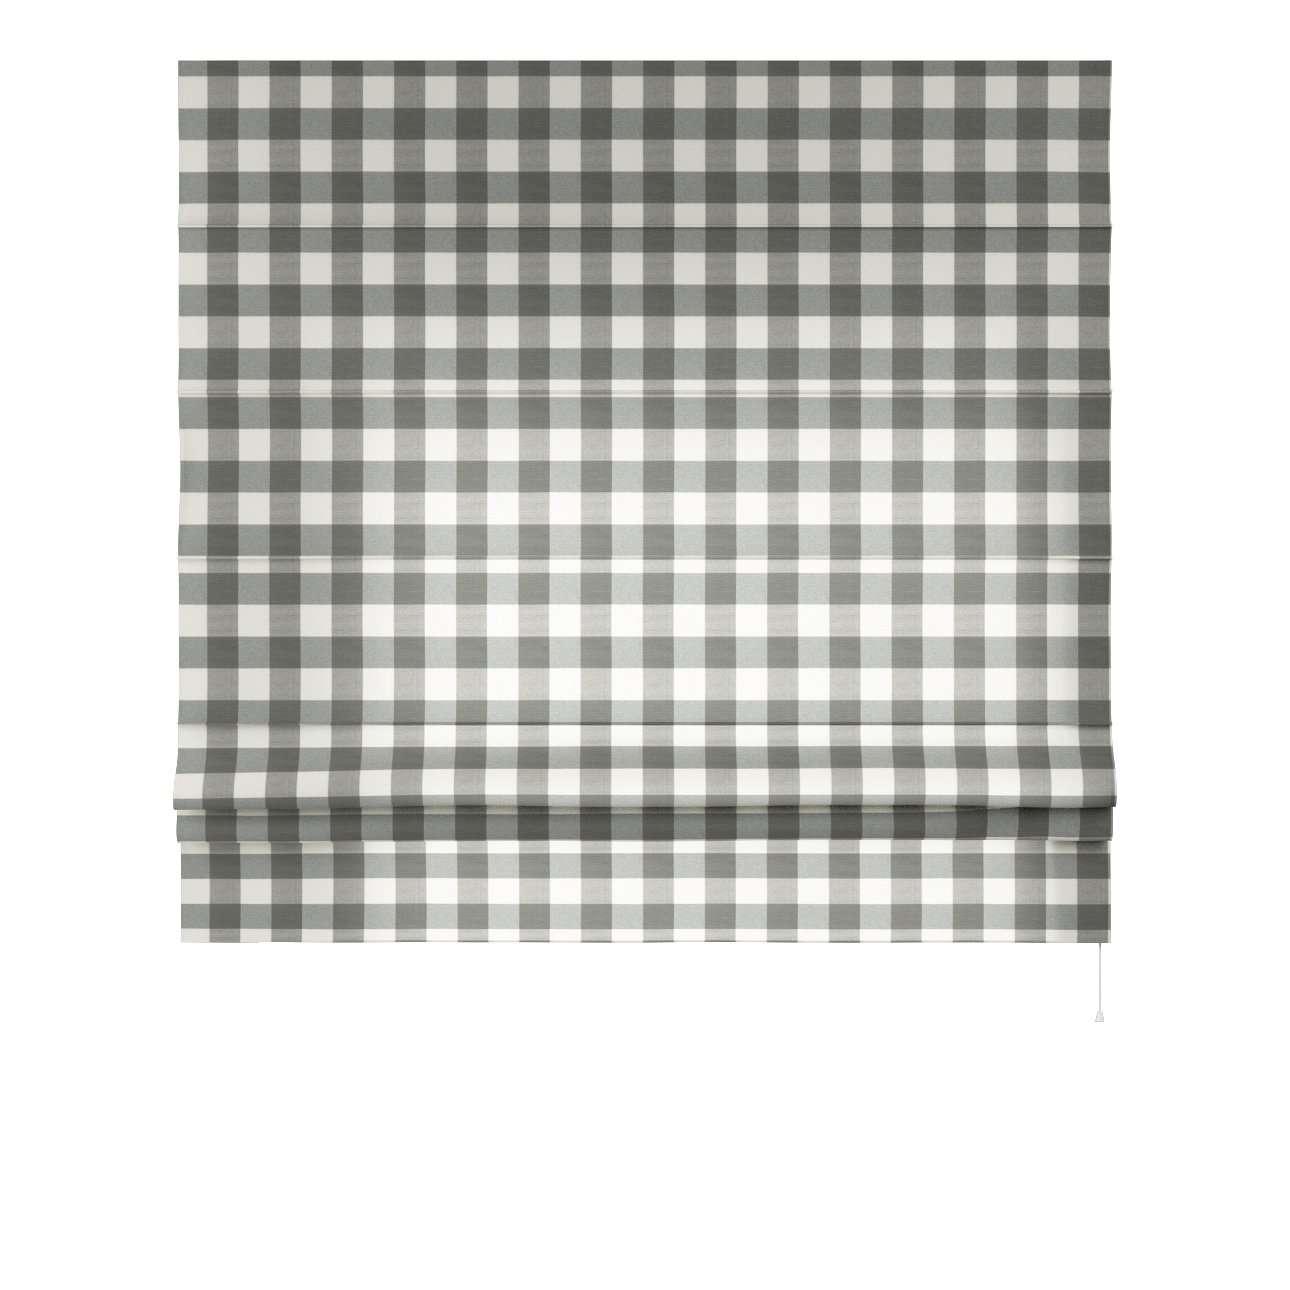 Romanetės Padva 80 x 170 cm (plotis x ilgis) kolekcijoje Quadro, audinys: 136-13